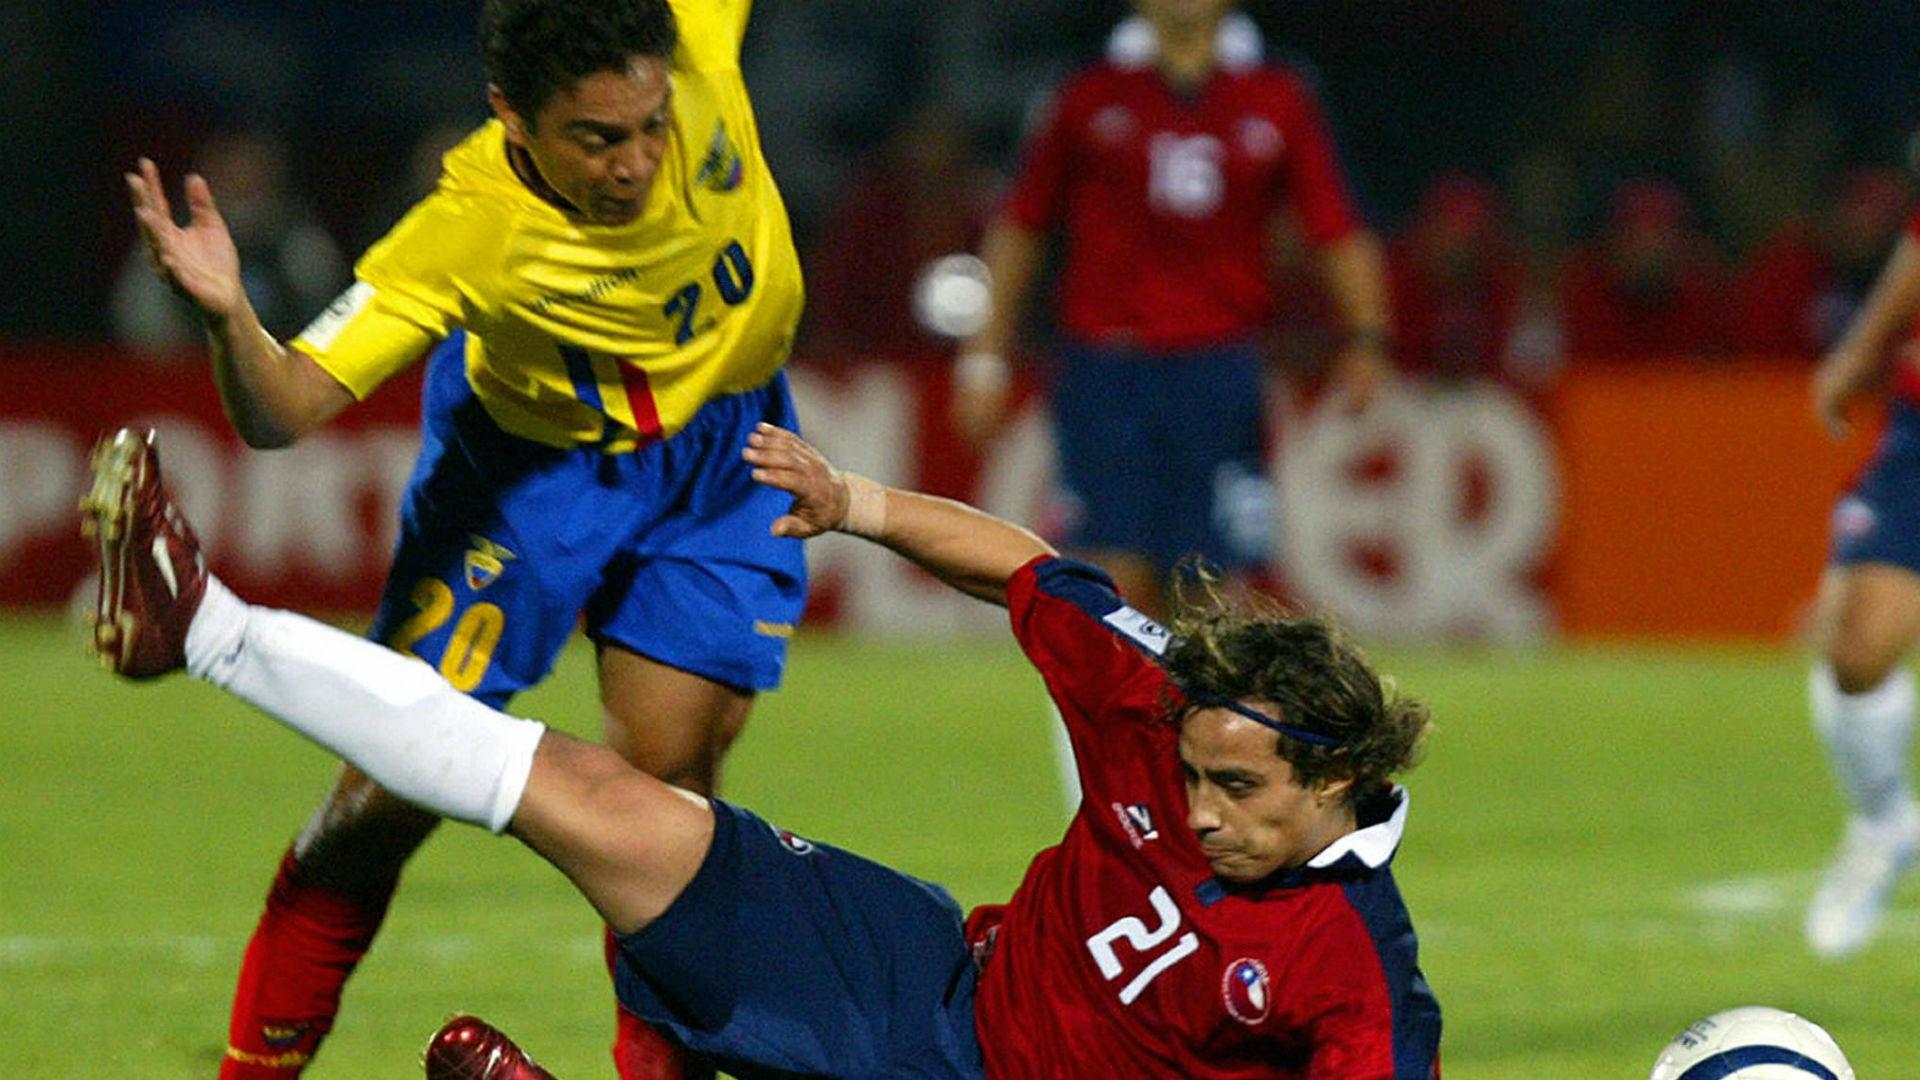 Edwin Tenorio. Jorge Valdivia Ecuador Chile 2005 Eliminatorias